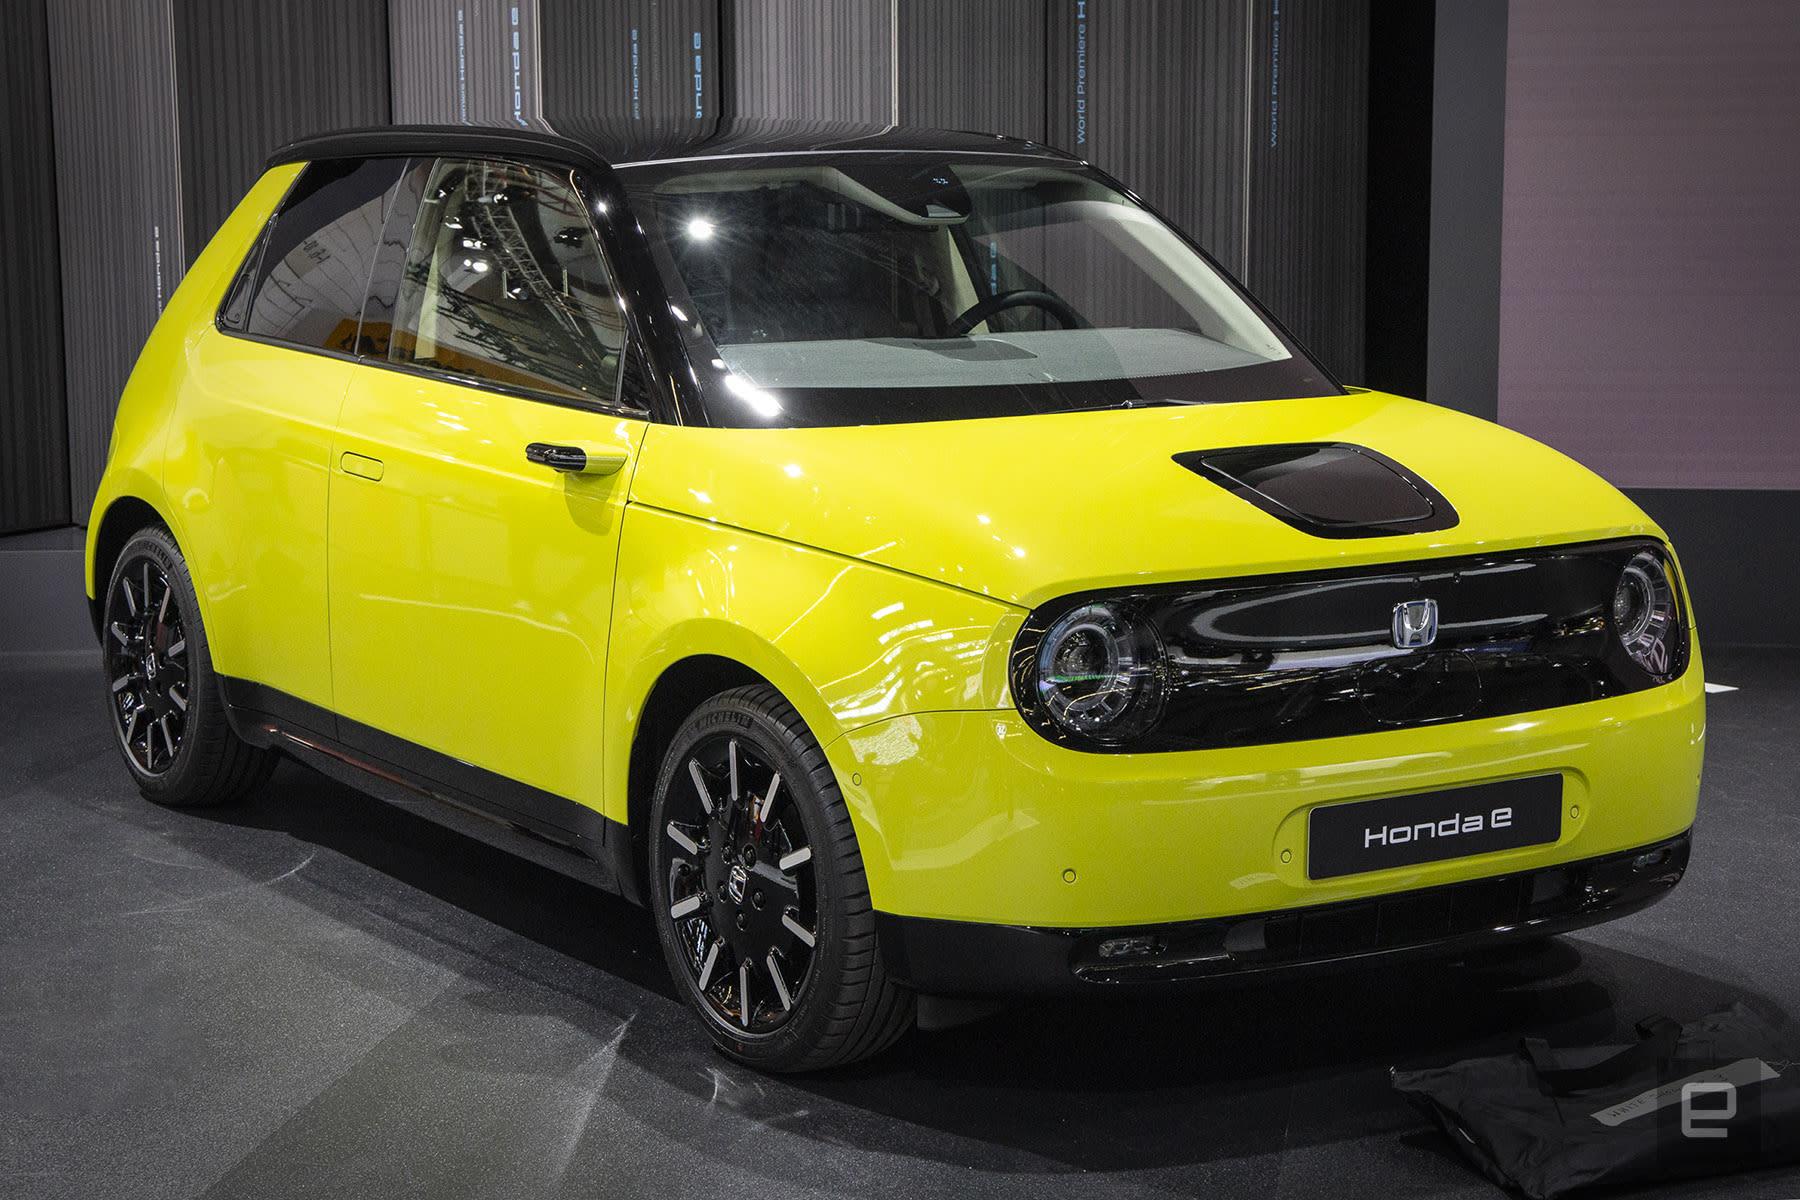 Honda E electric production vehicle